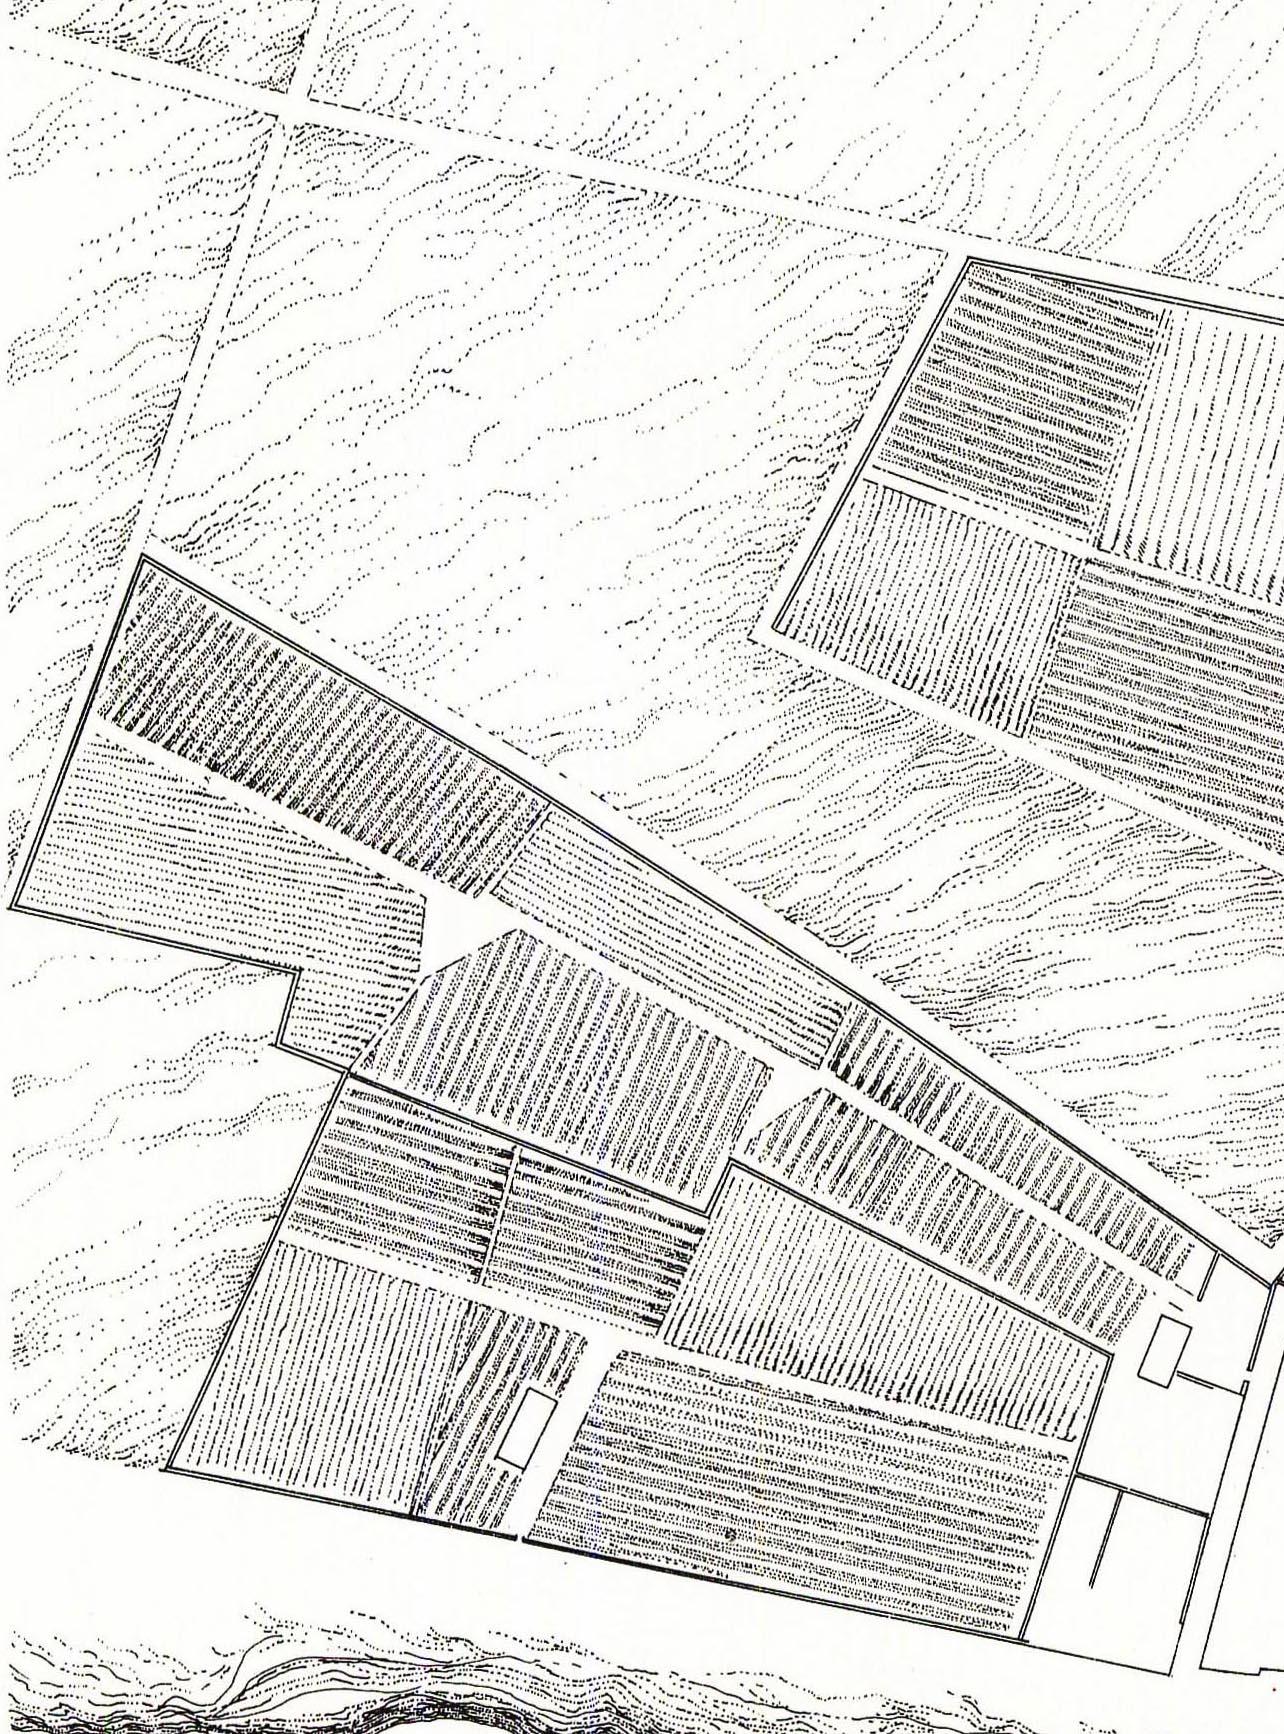 danielvillalobos-valladolid-blueprints-renaissance-c.2